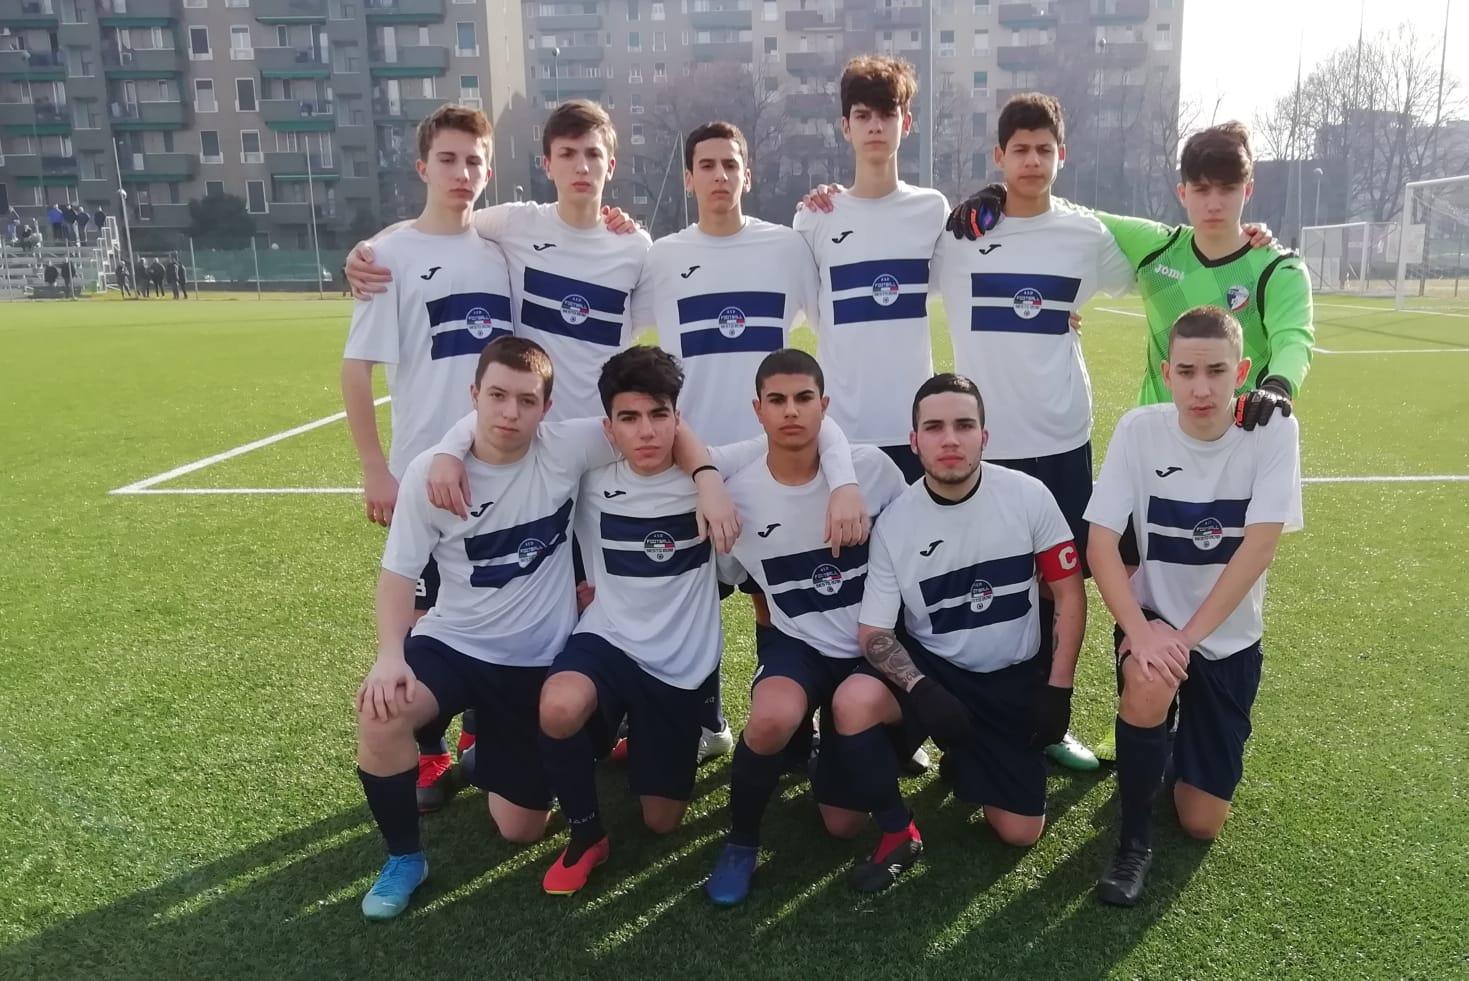 Sesto 2012 - Villapizzone Under 17 Milano